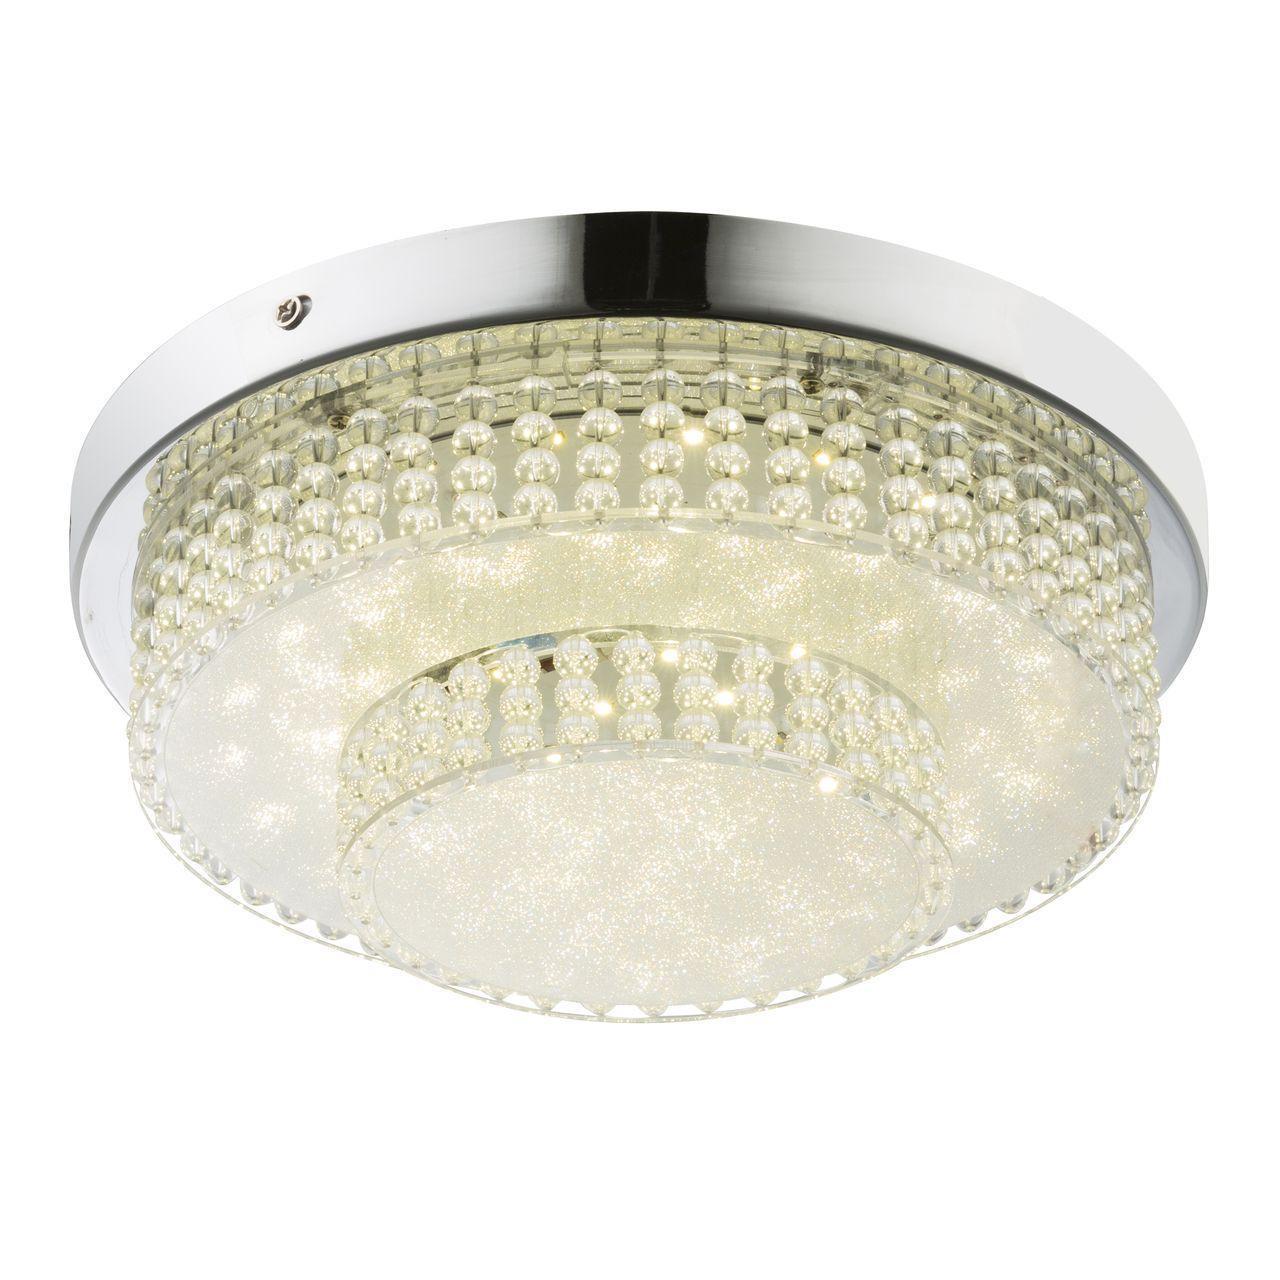 Потолочный светильник Globo 48213-16, белый цены онлайн